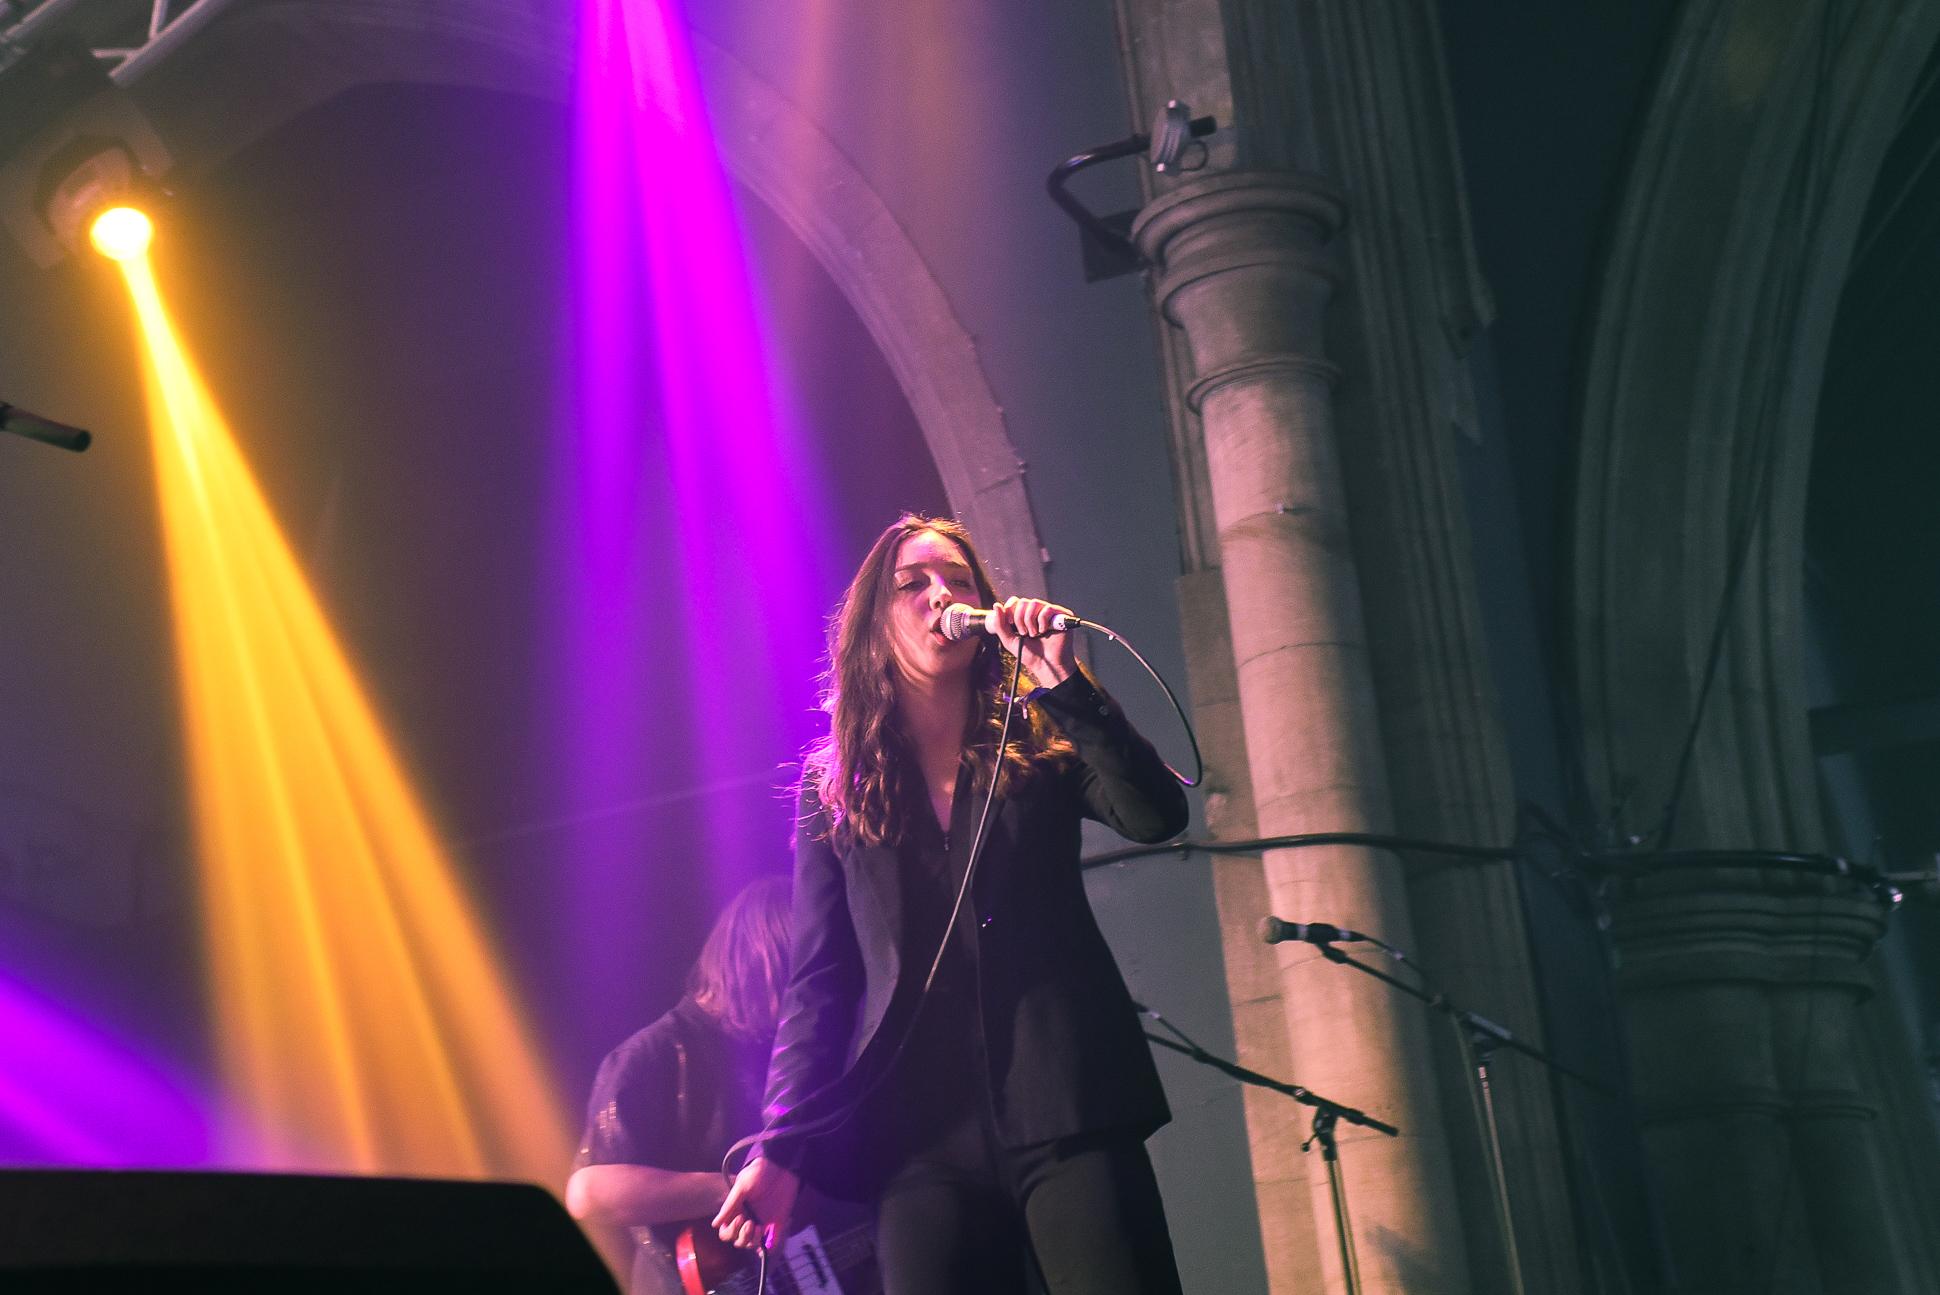 Live At Leeds 2019 - The Mysterines-7.jpg